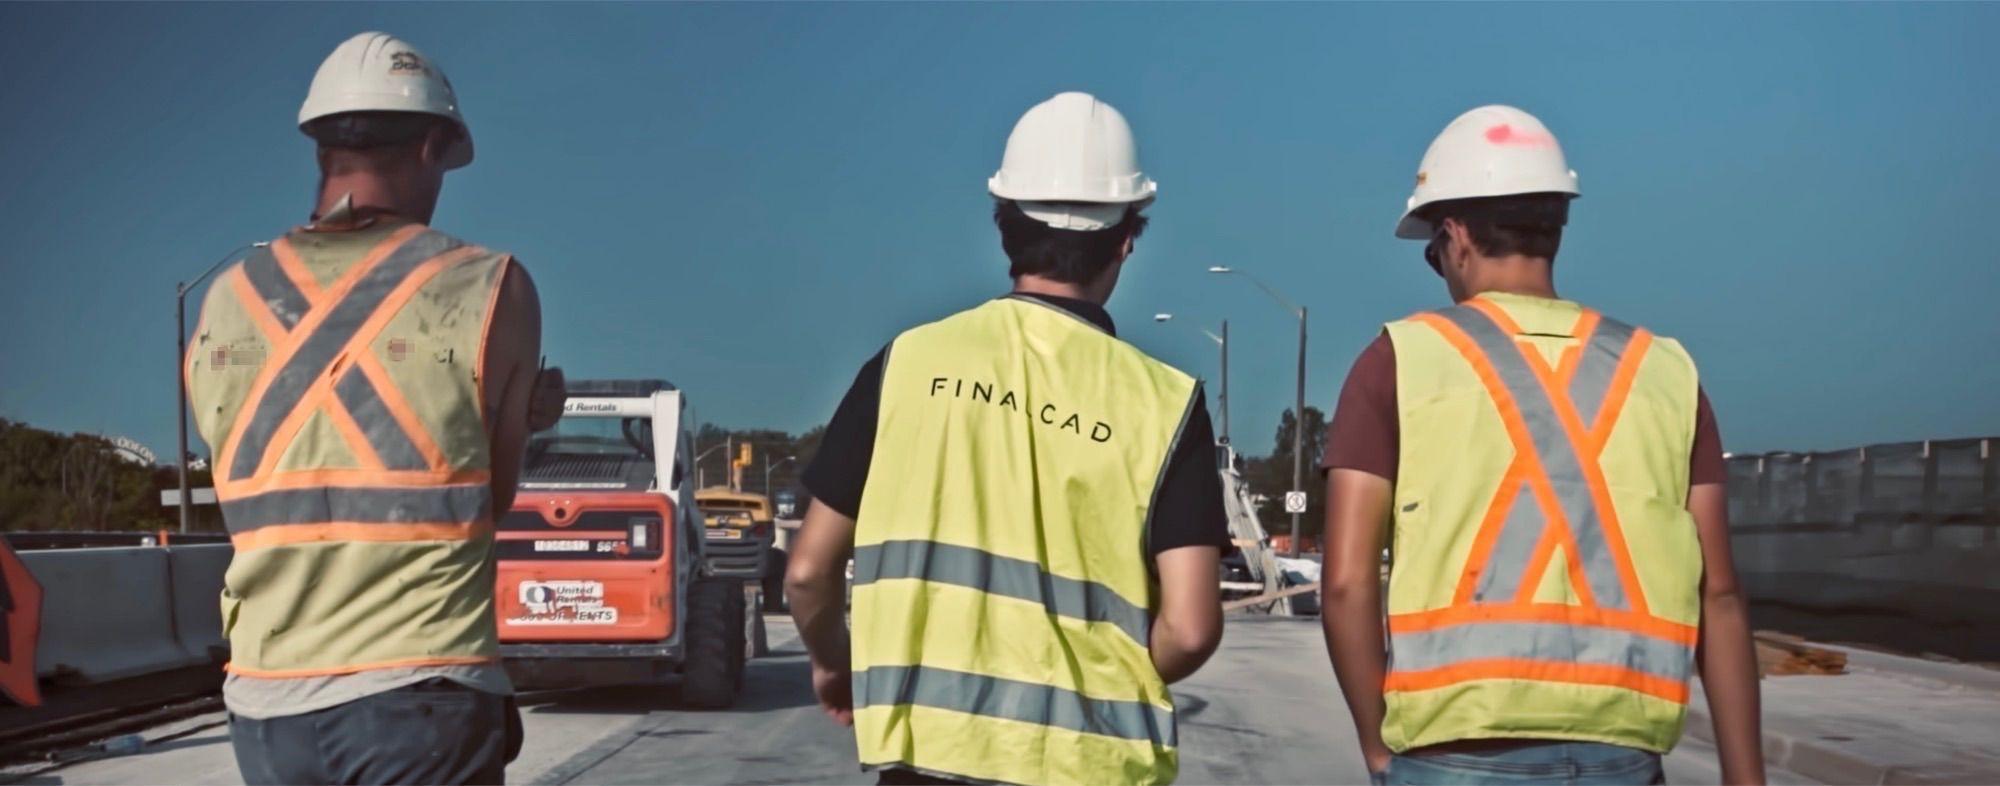 FINALCAD-change-road-team